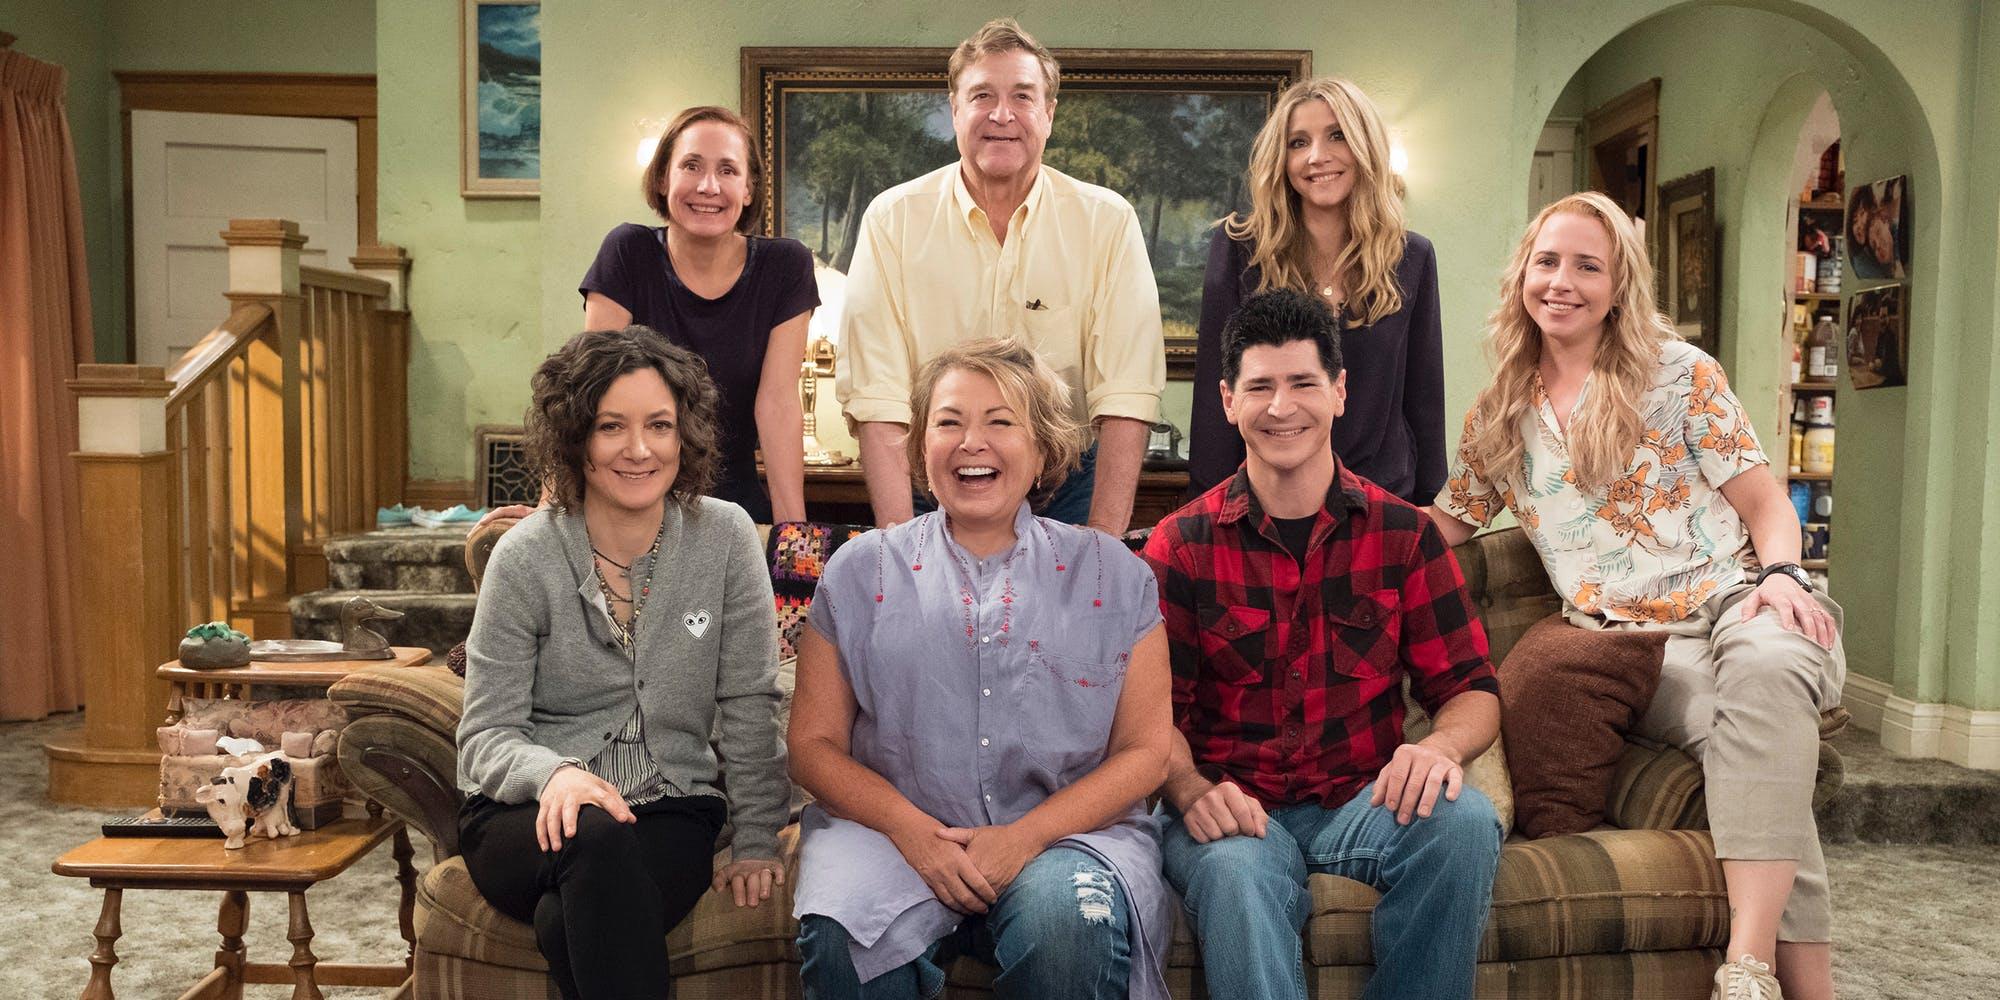 Roseanne revival cast photo